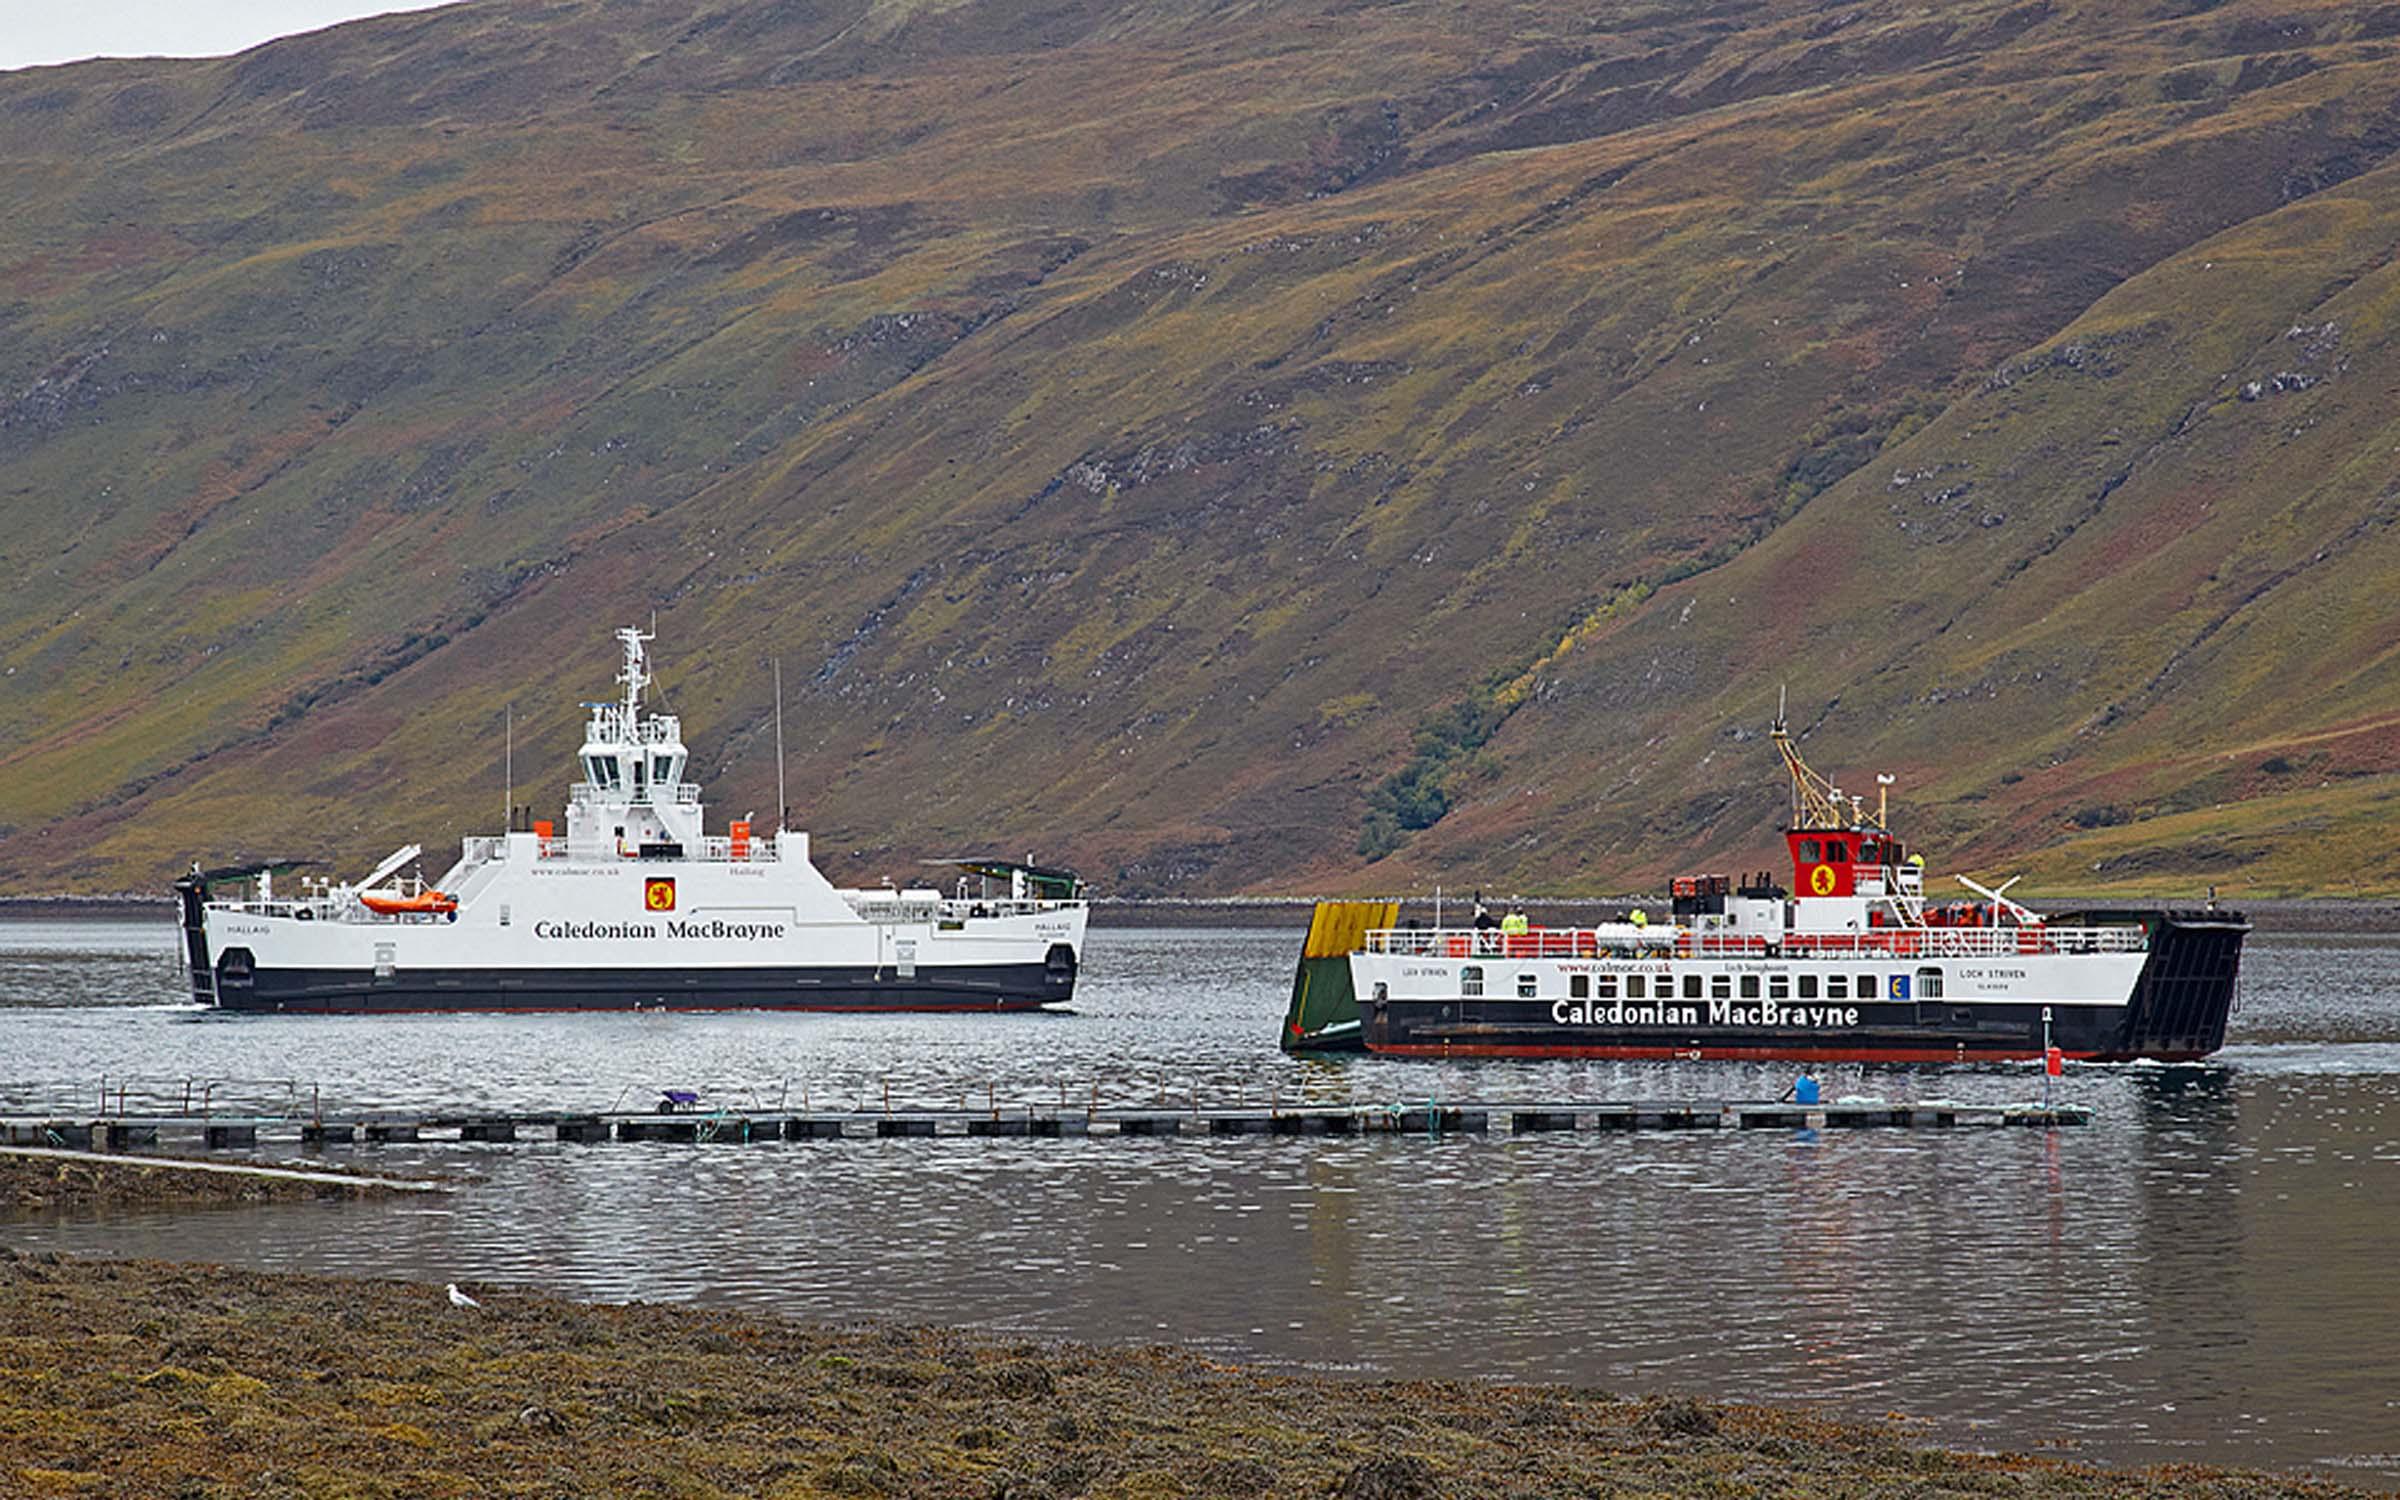 Hallaig and Loch Striven at Sconser (Ships of CalMac)